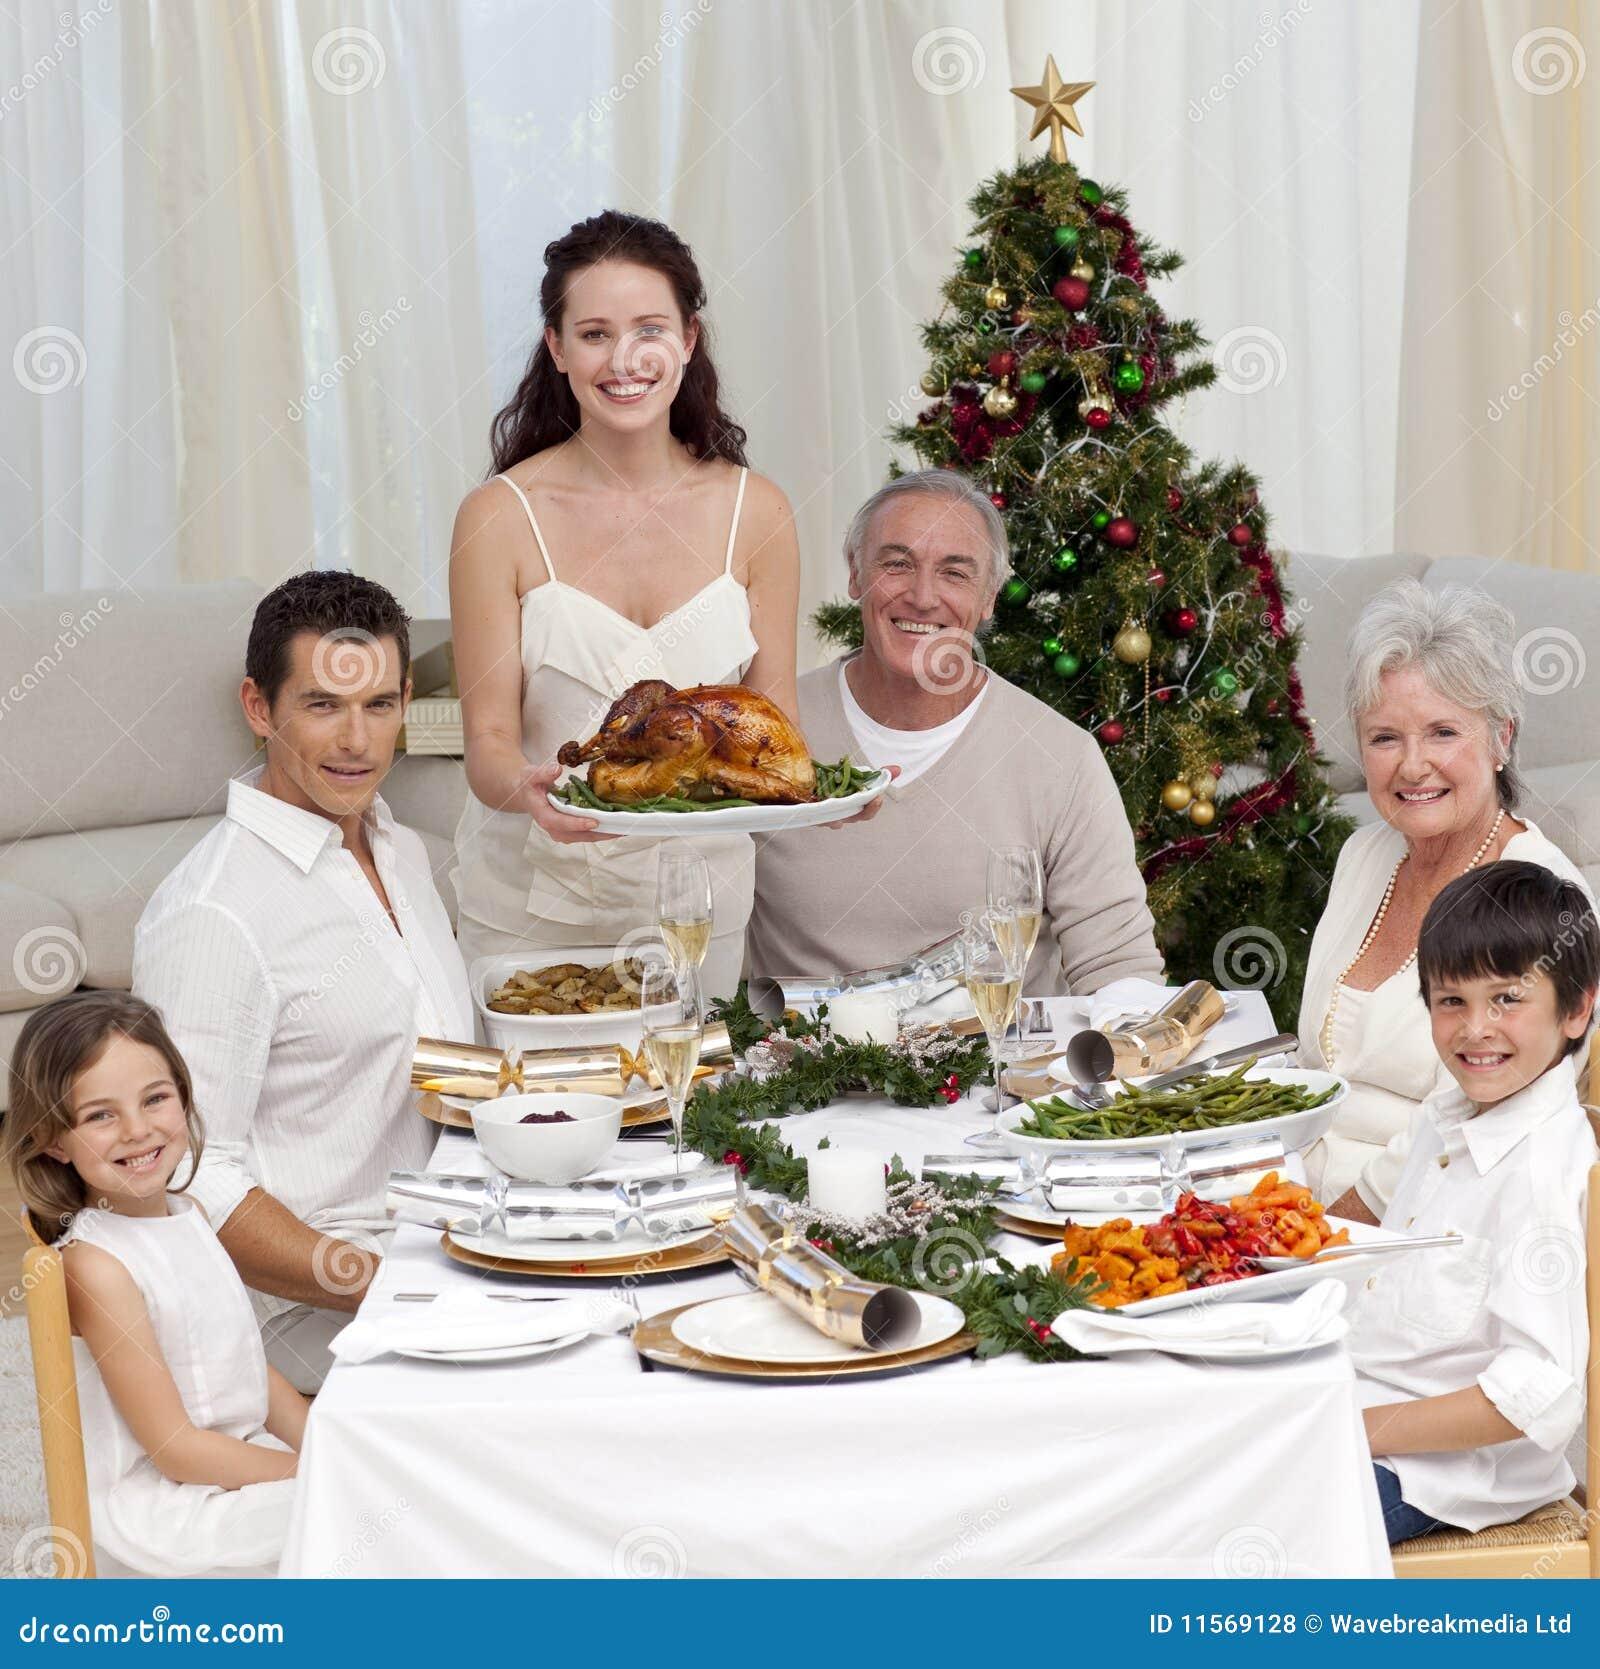 Family Celebrating Christmas Dinner With Turkey Royalty Free Stock Photos